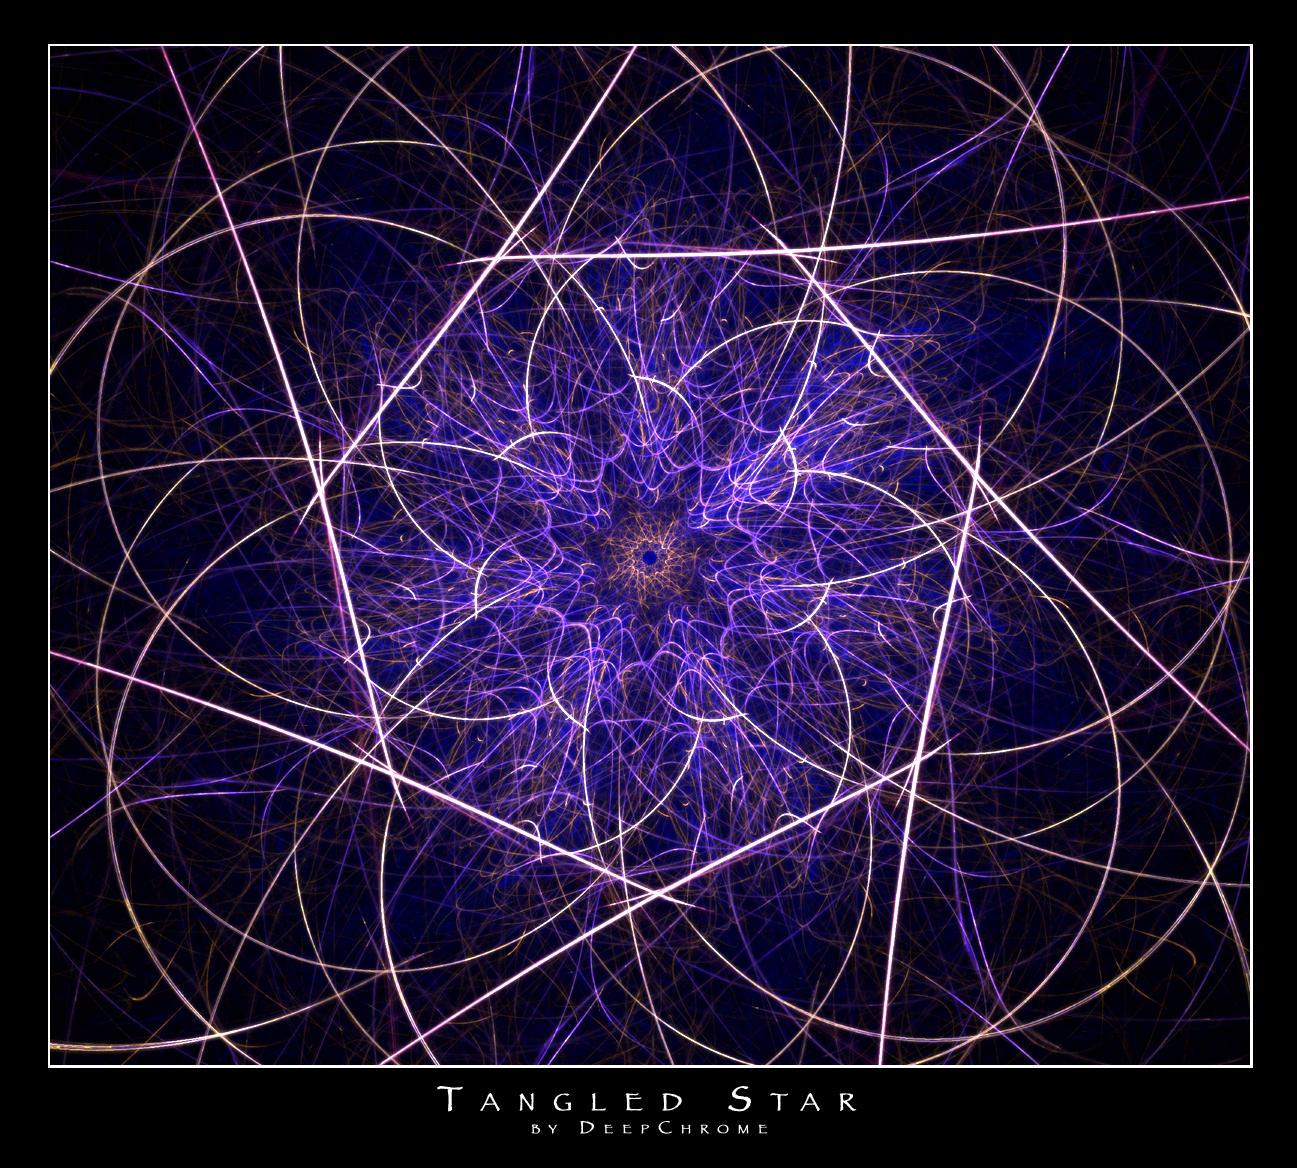 Tangled Star by DeepChrome